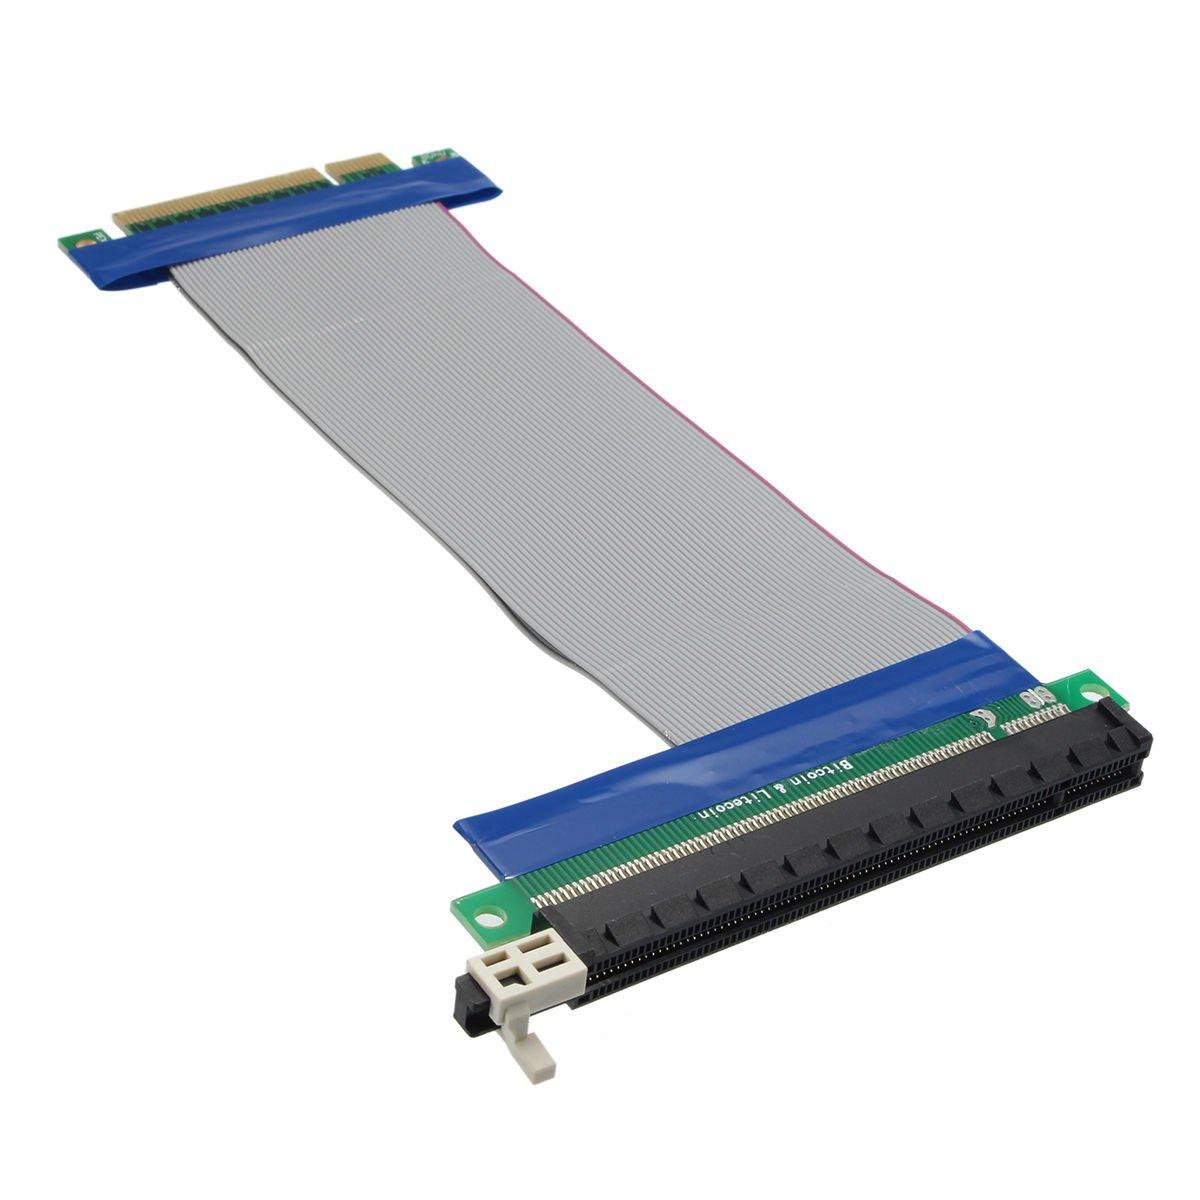 PCI-E PCIE PCI Express 8x to 16x Extension Cable Flex Ribbon 20cm Long